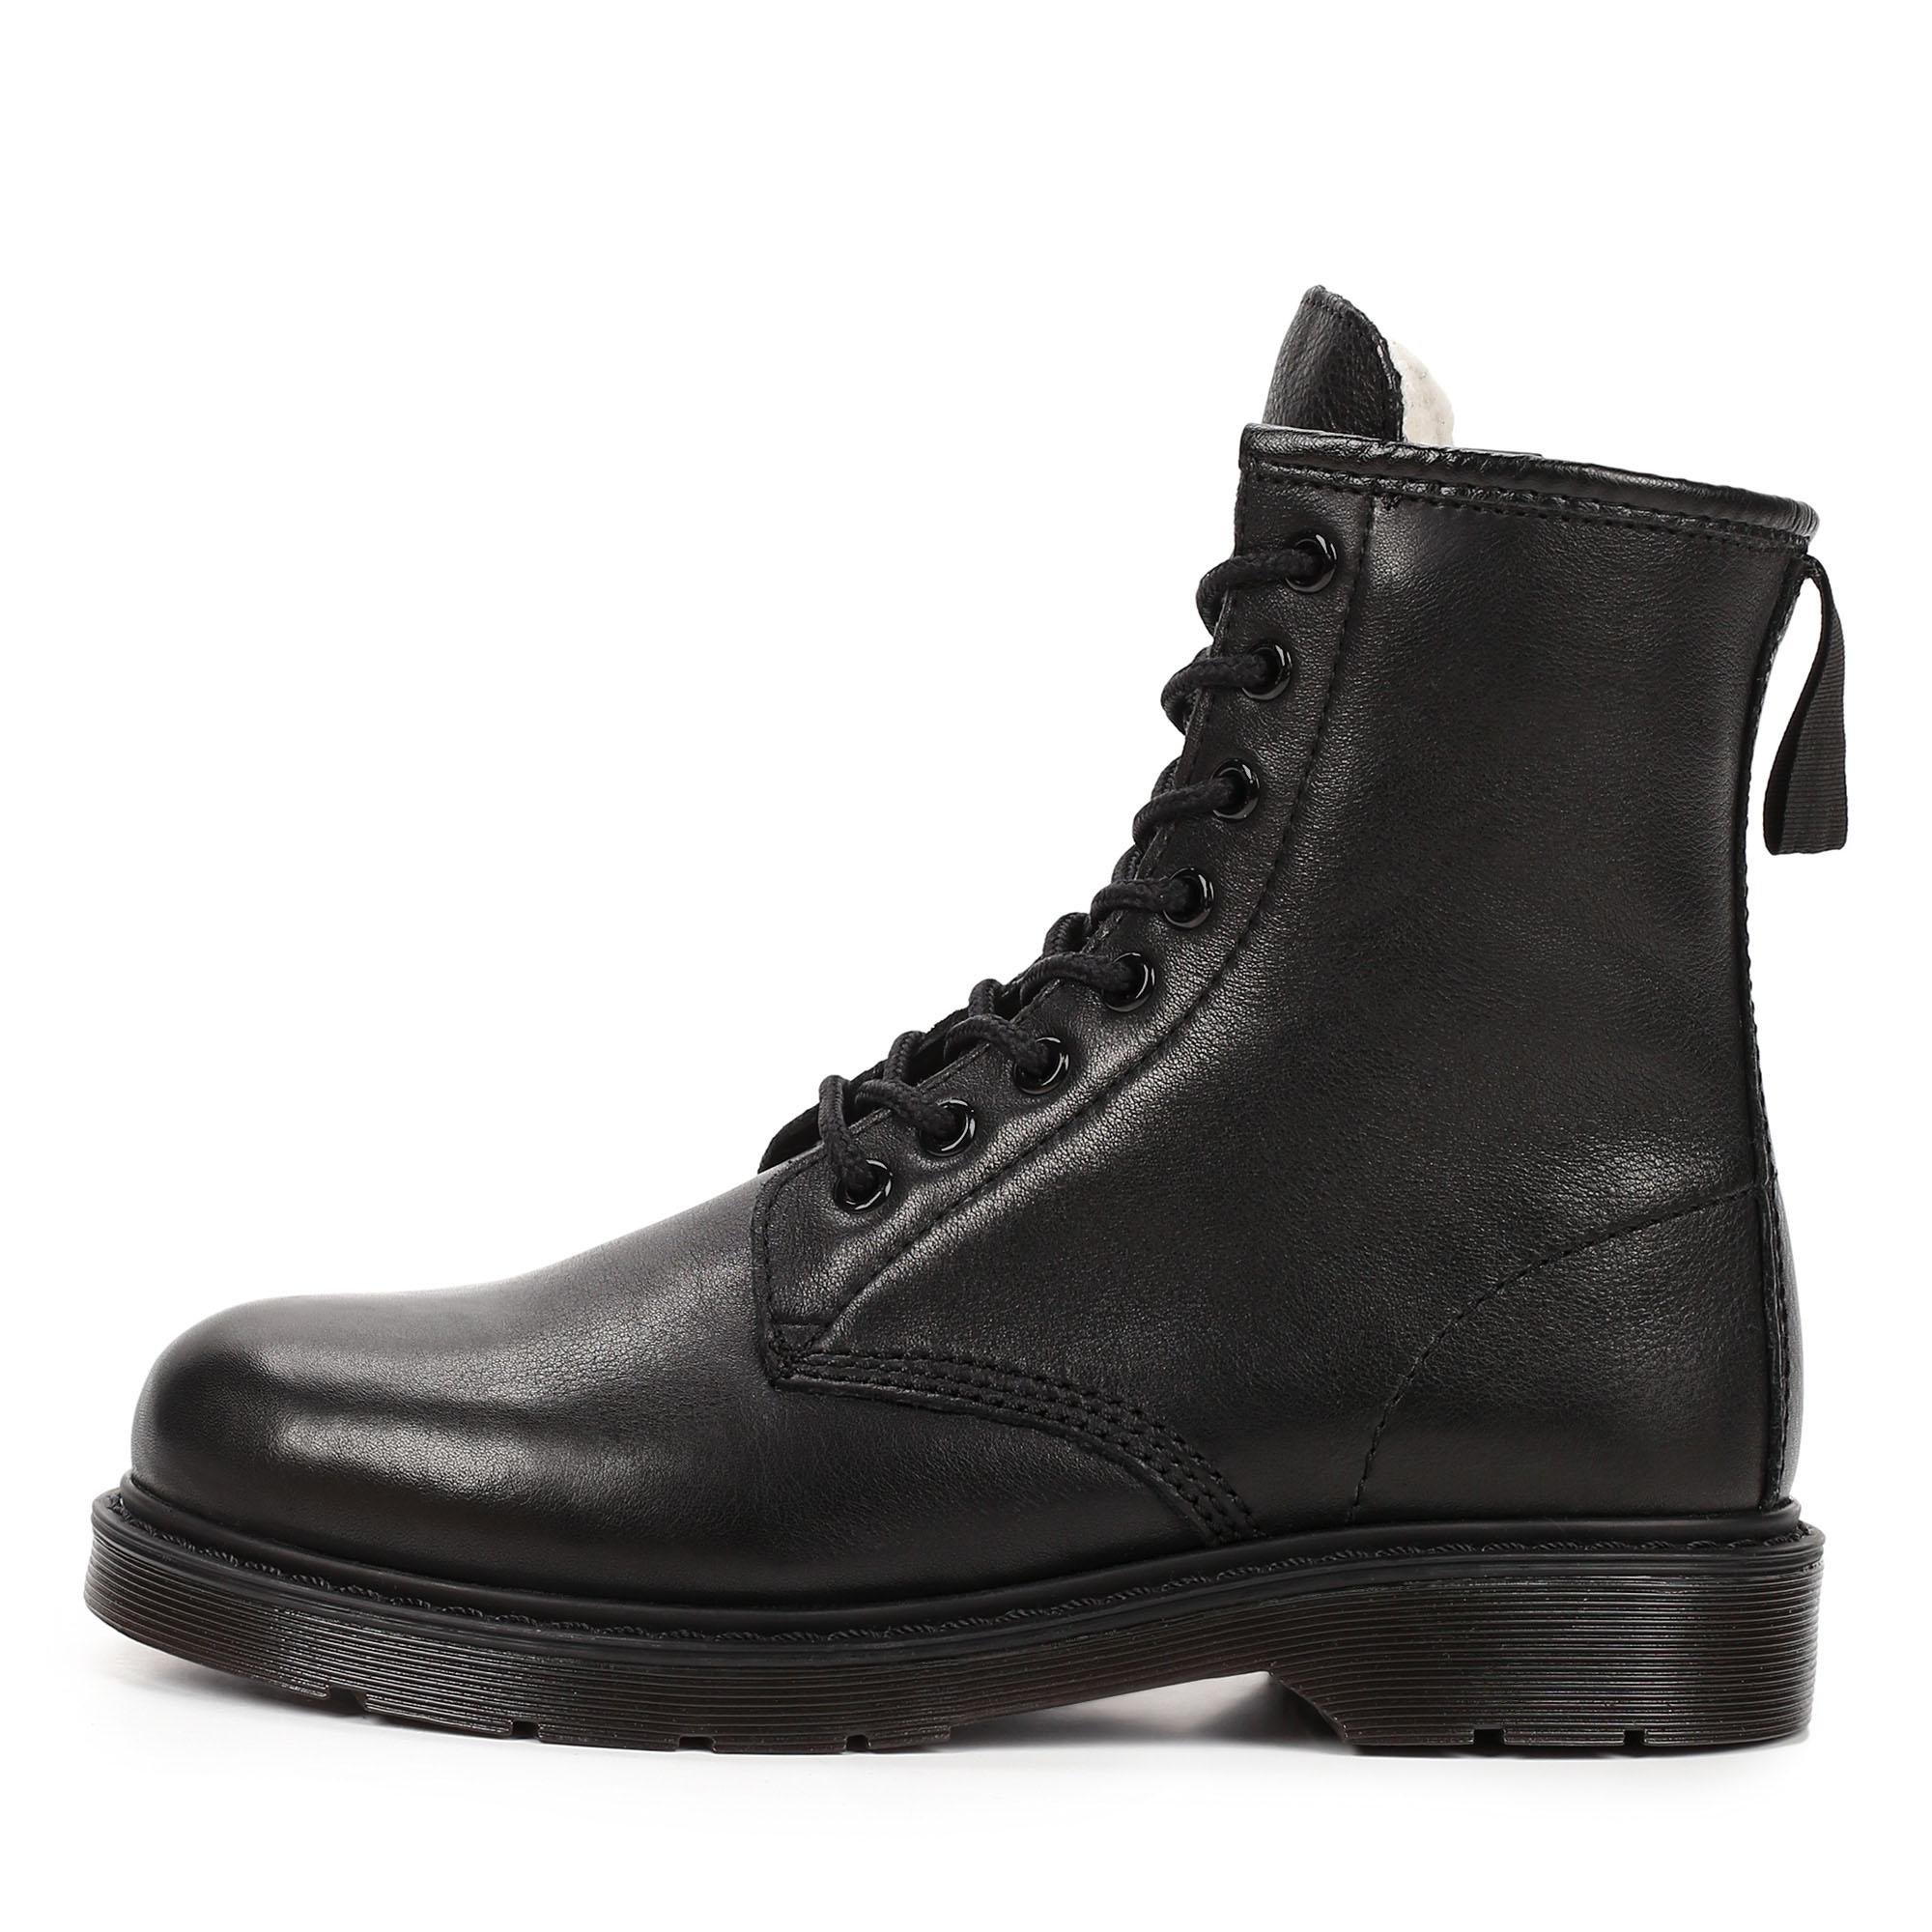 Ботинки Thomas Munz 569-162A-4102